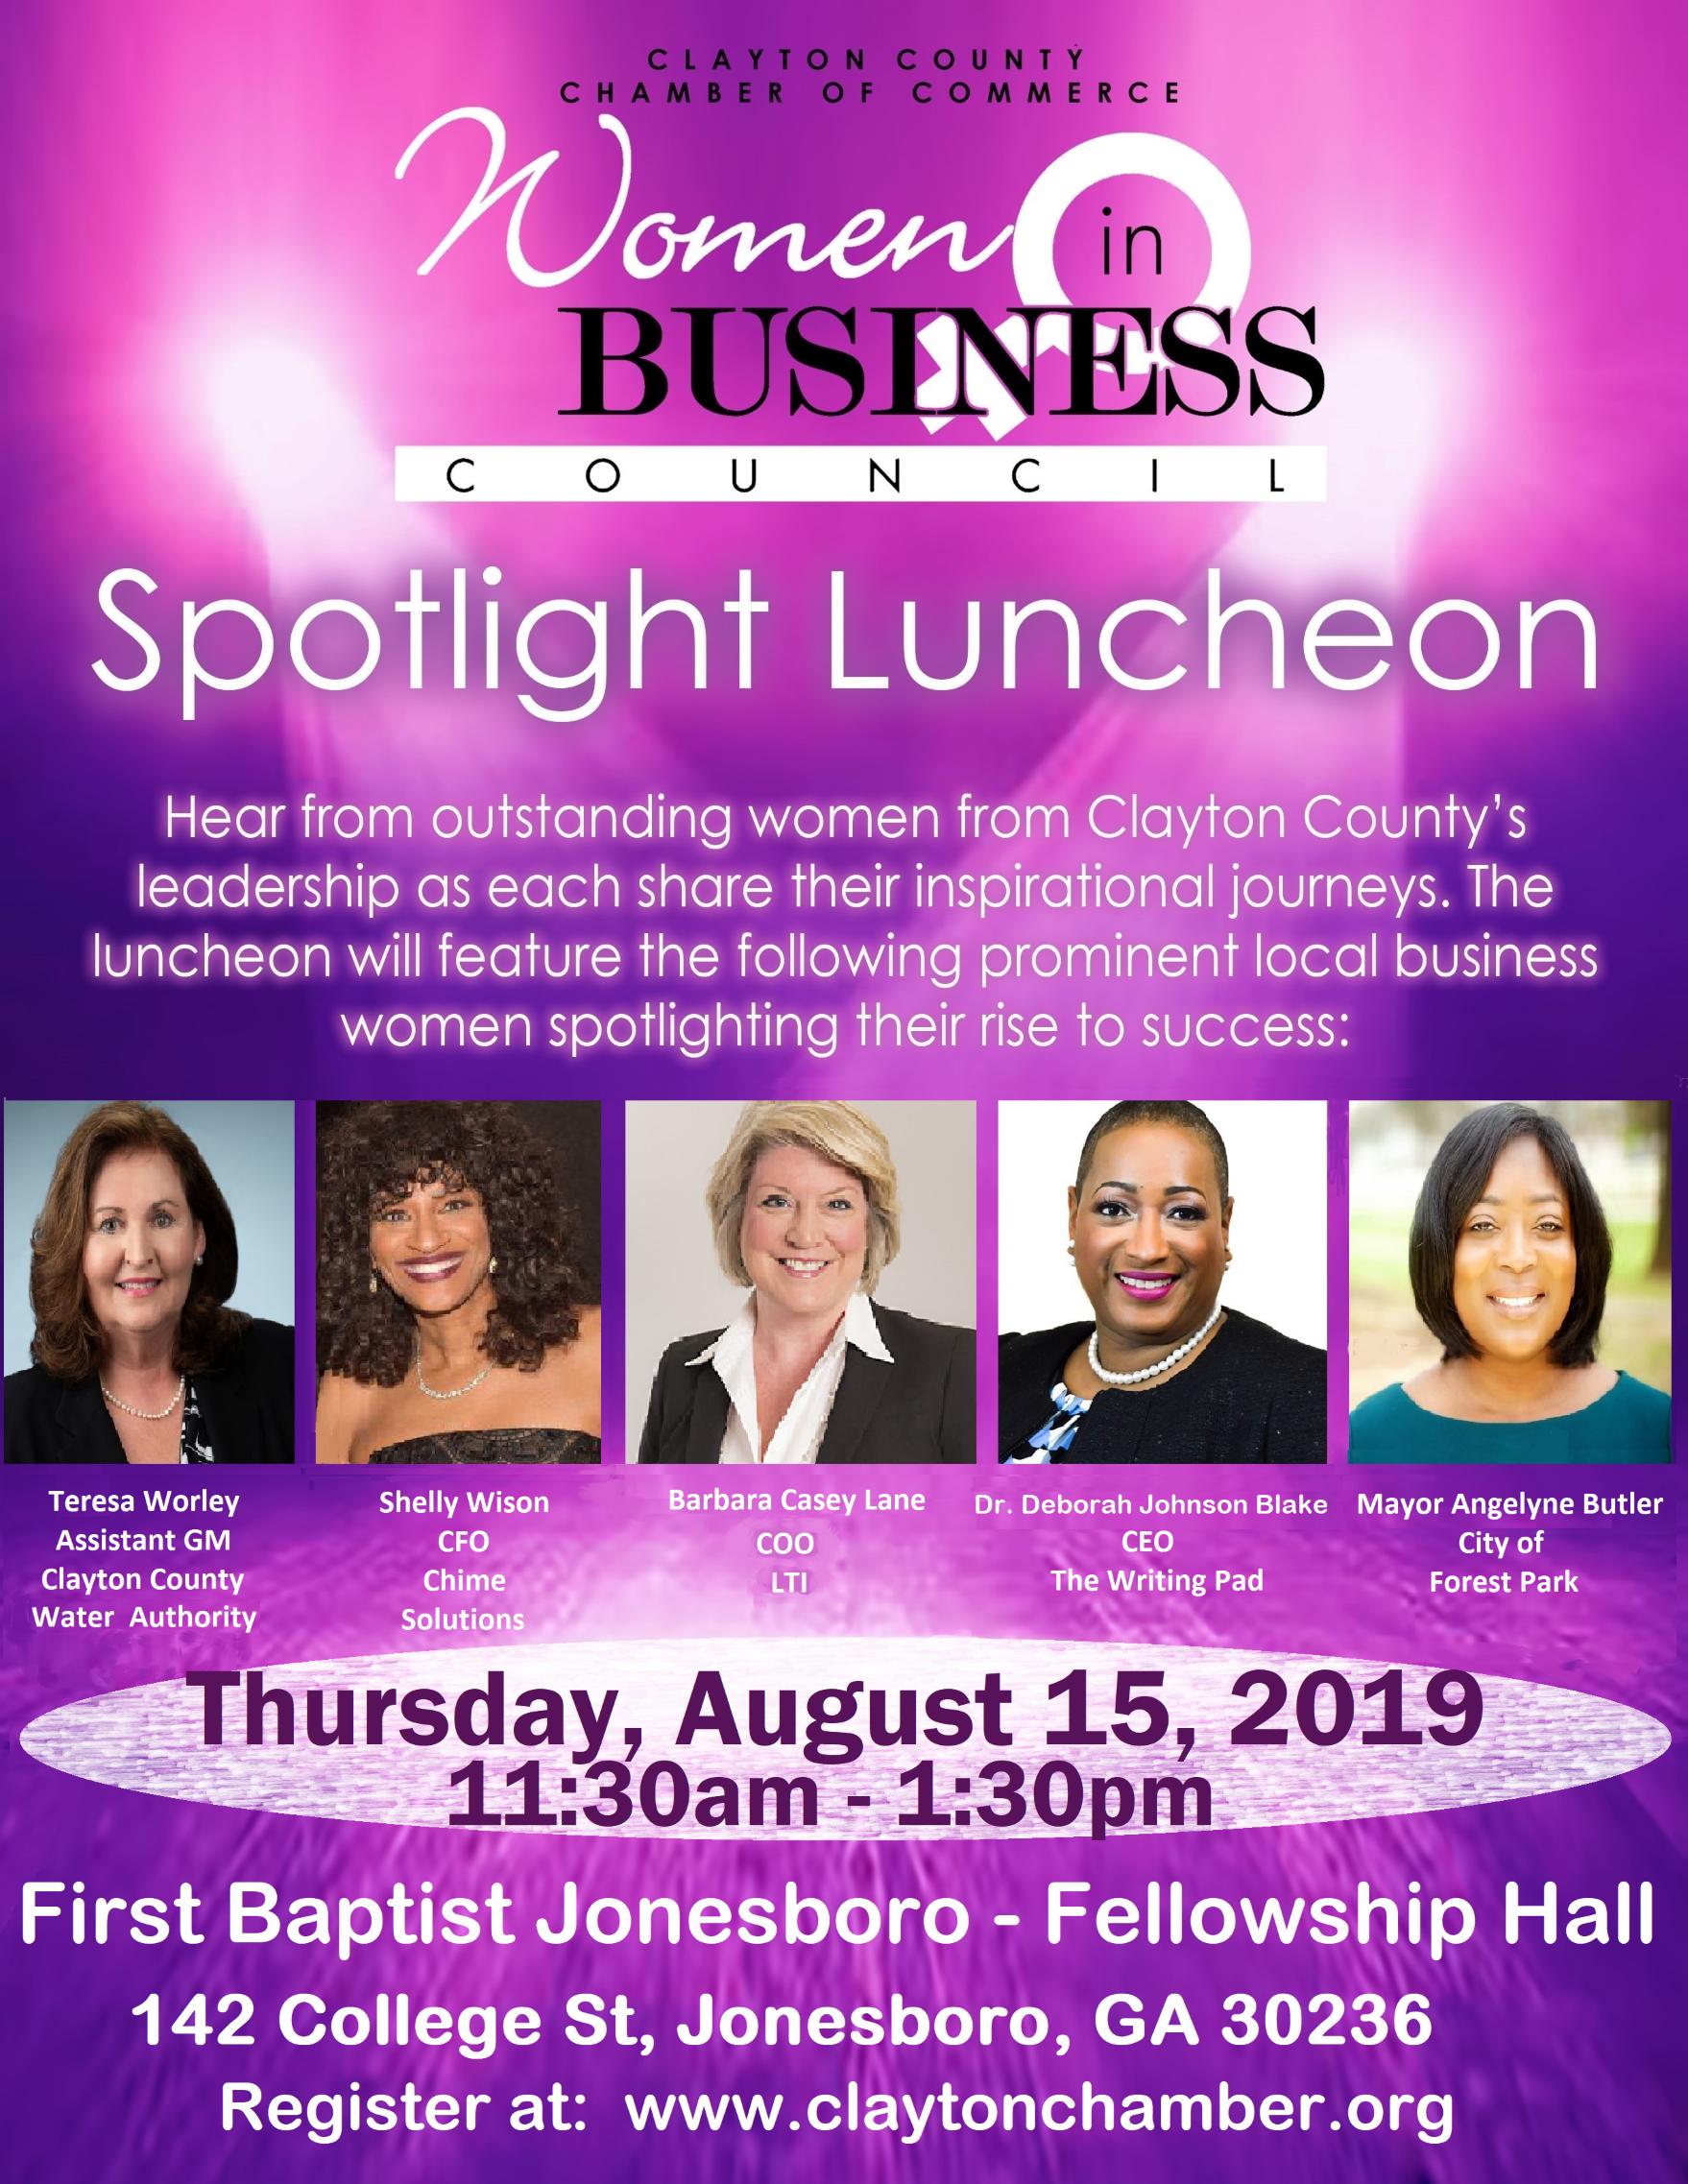 Women in Business Council Spotlight Luncheon - 2019 - Aug 15, 2019